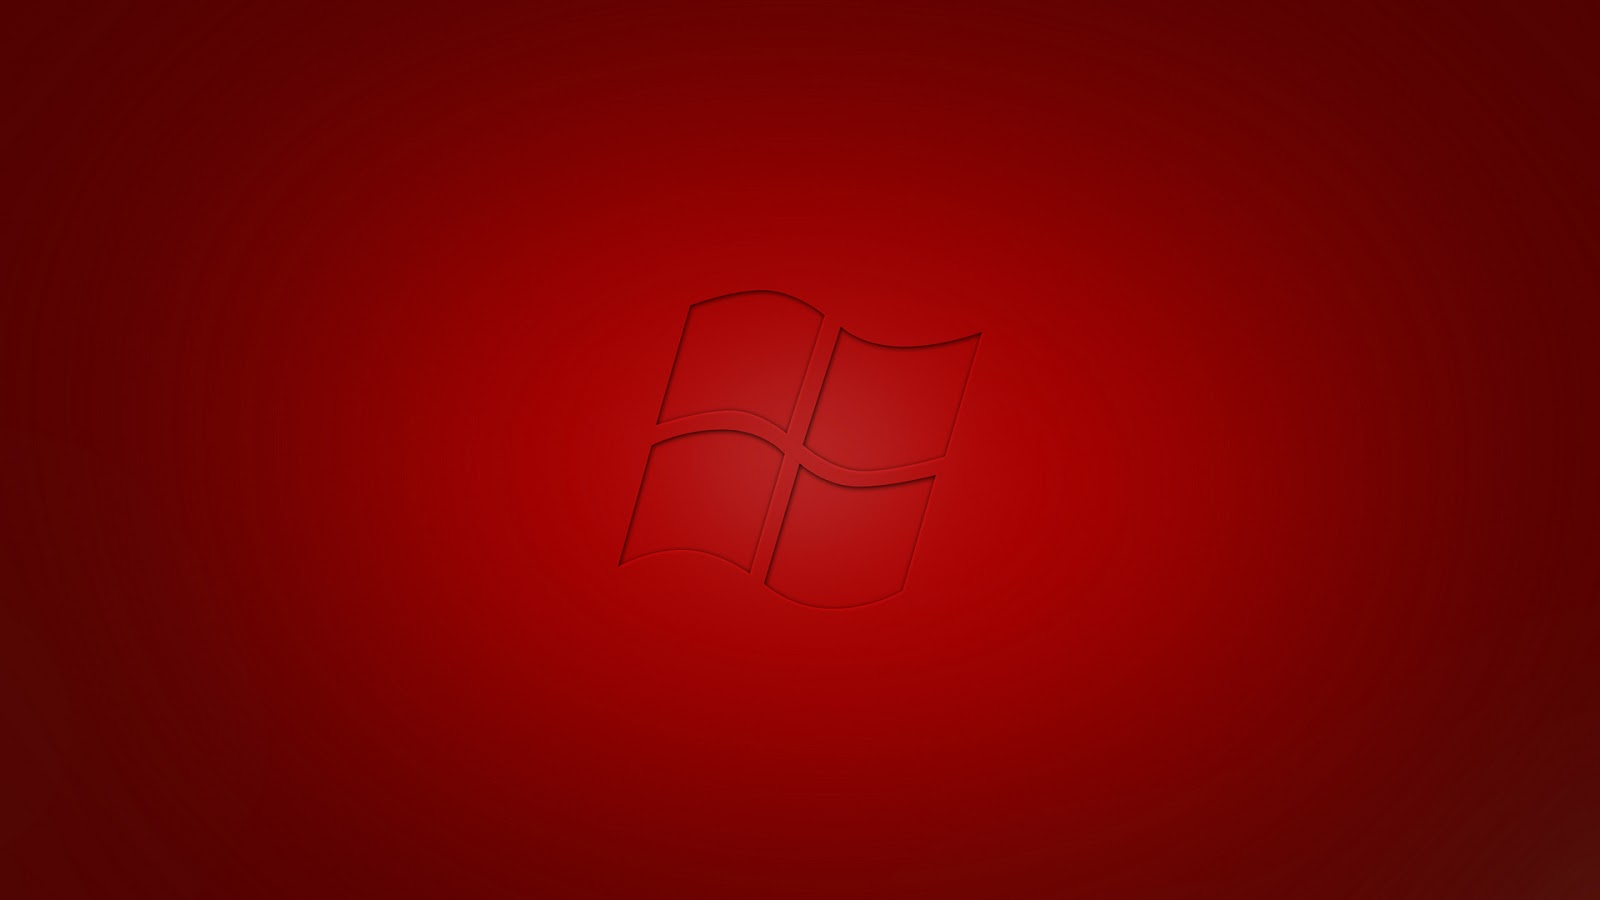 Windows 8 HD Wallpaper 1080p | Galerry Wallpaper